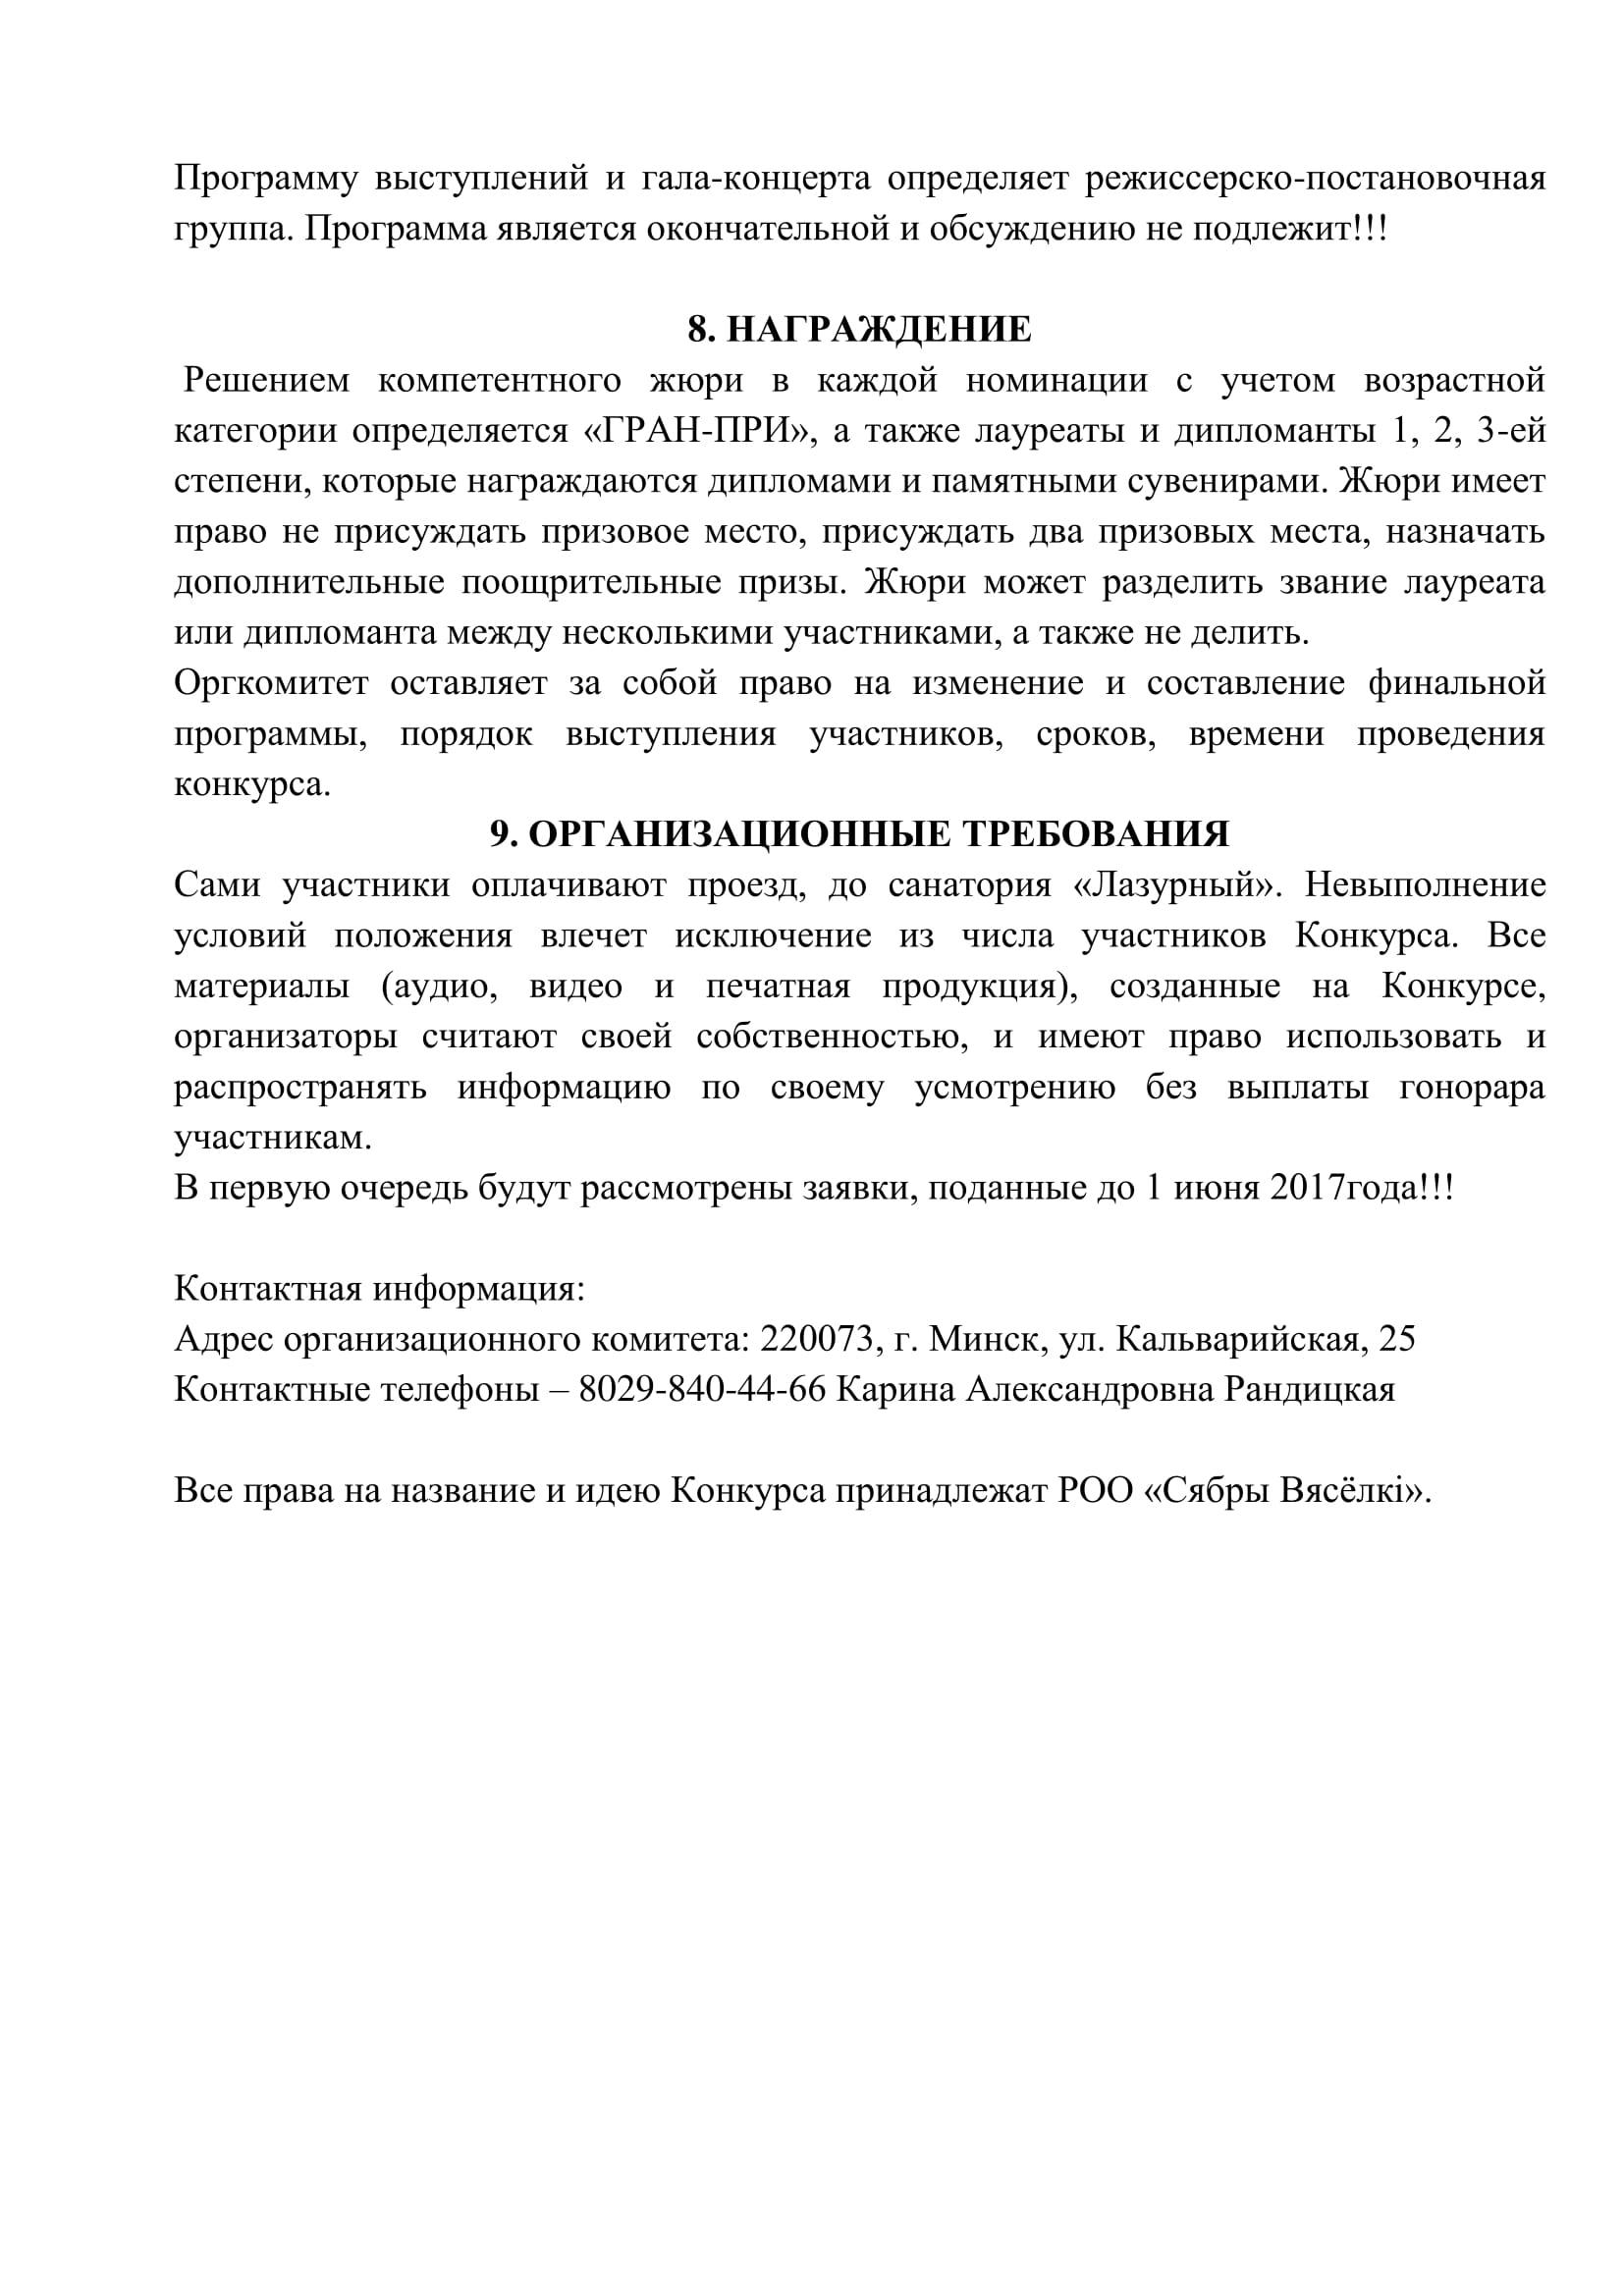 Galaxy_Academey_Polozhenie-5